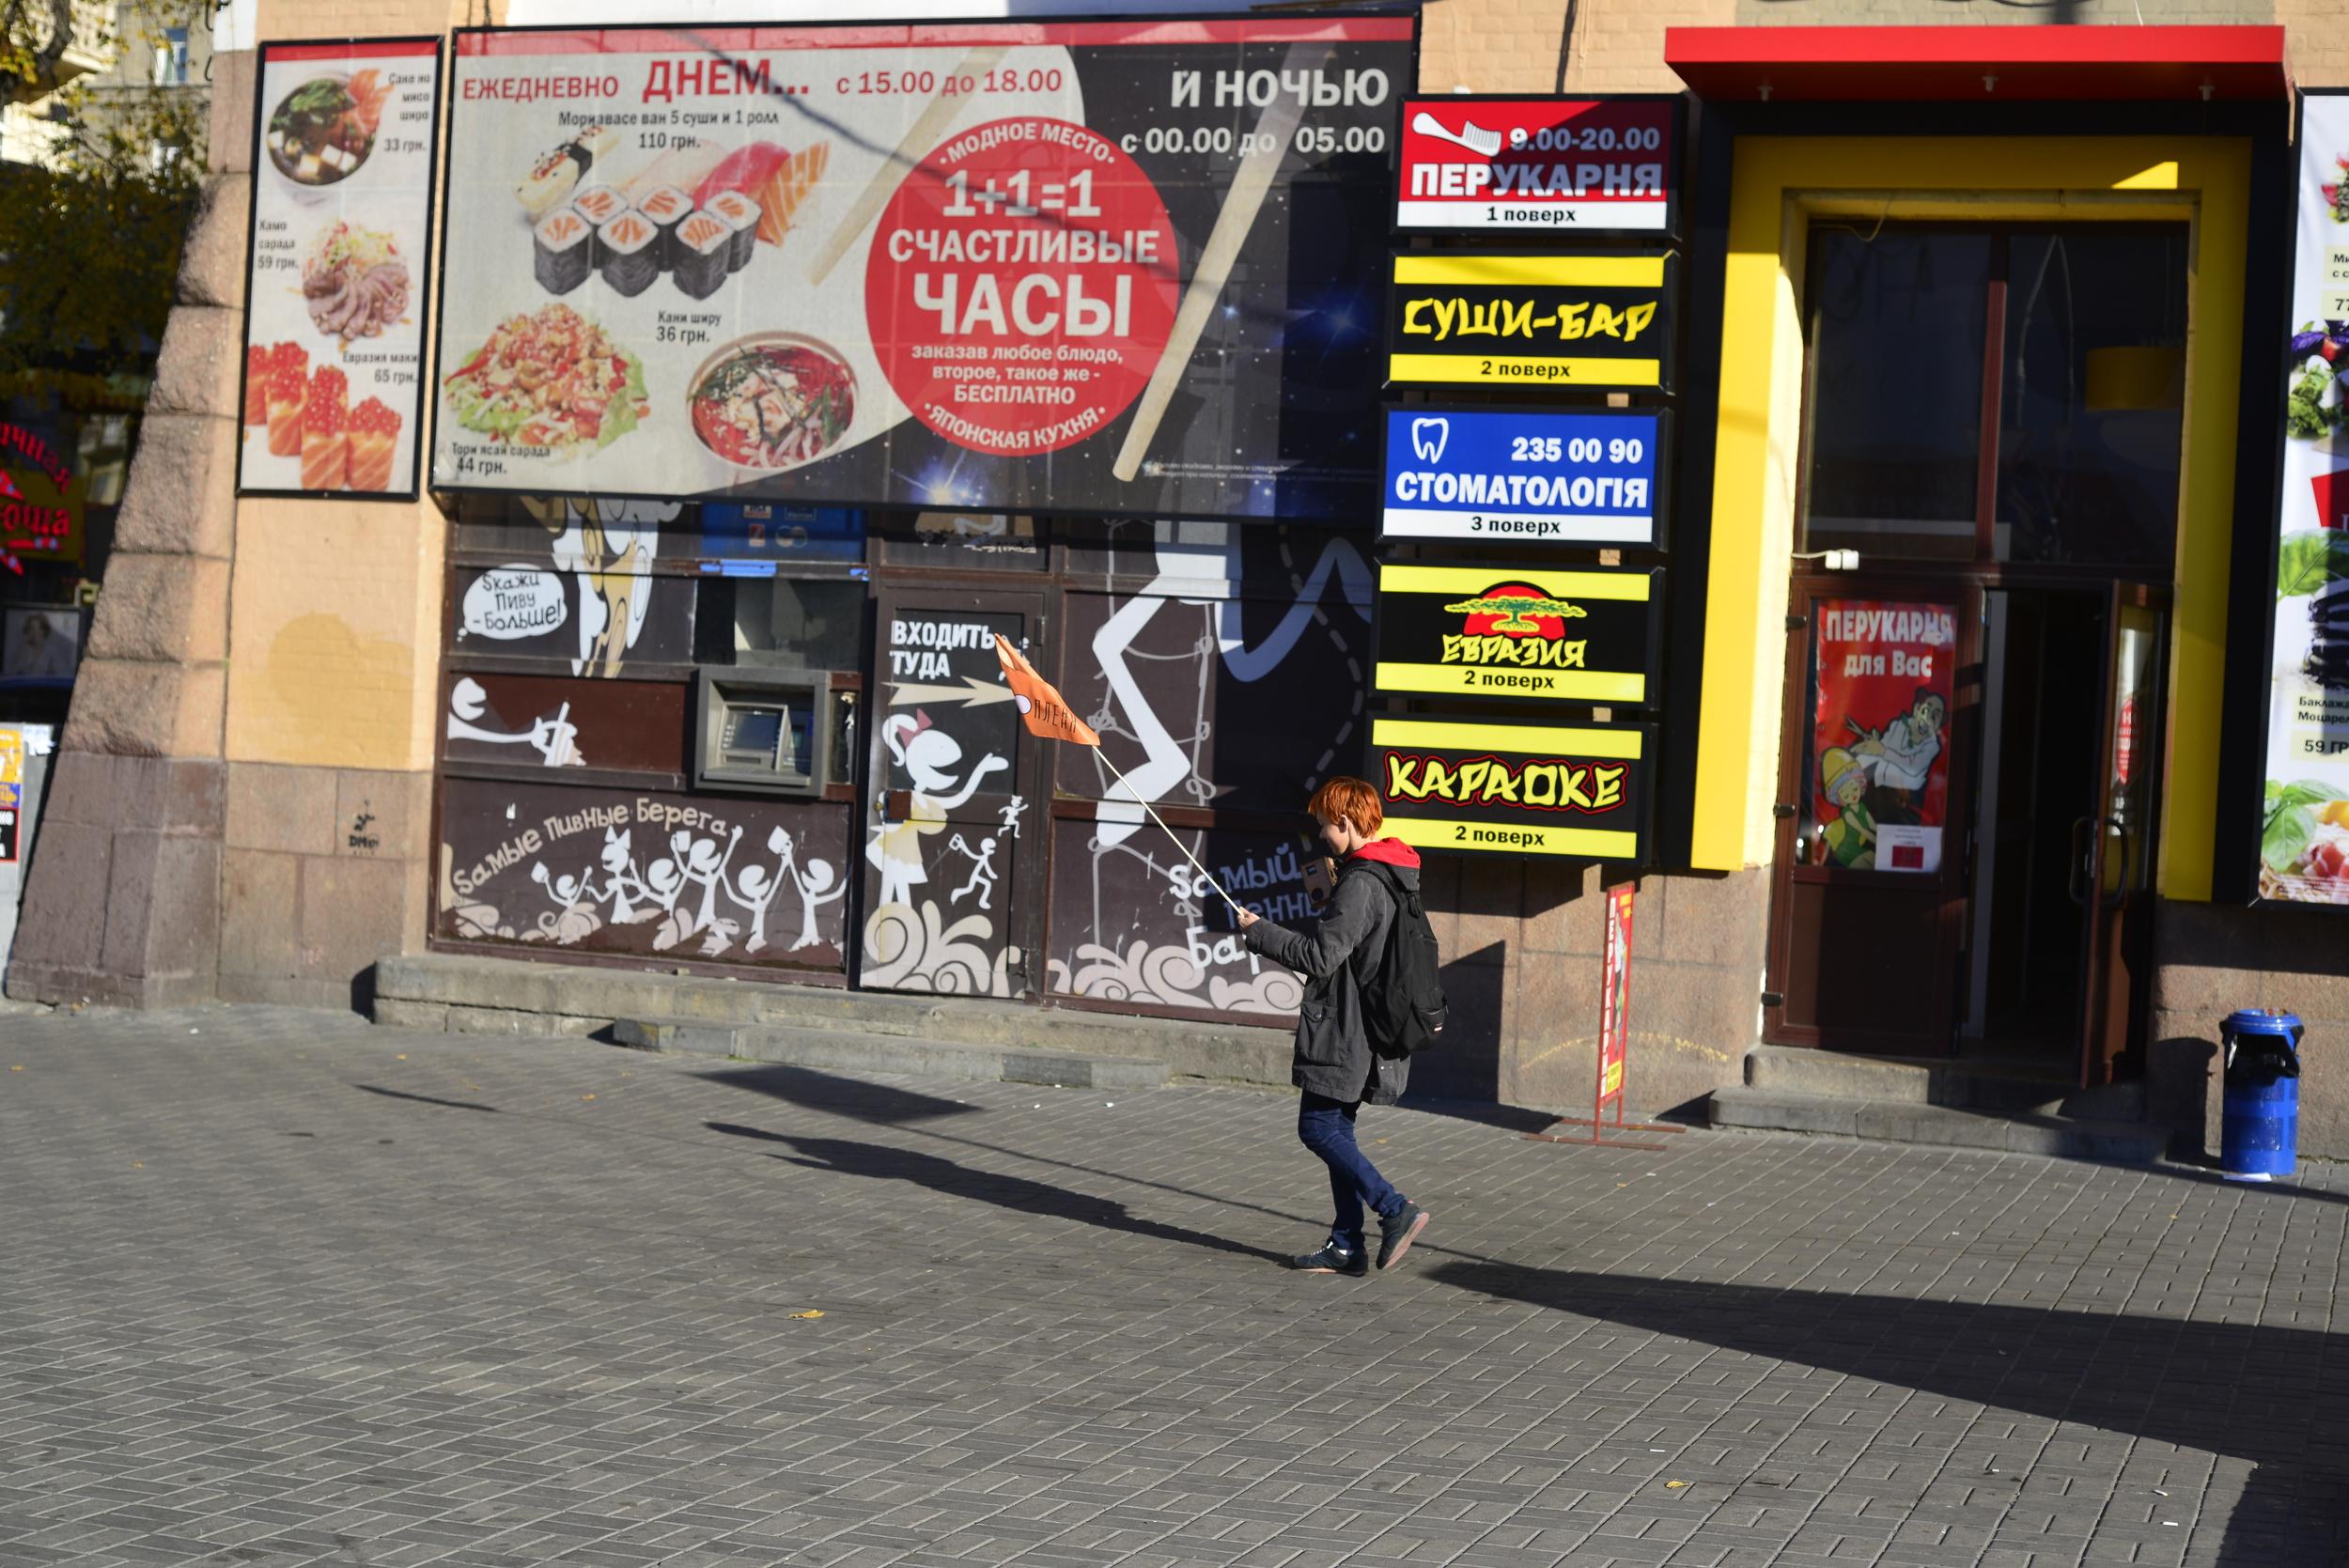 Photo: Izolyatsia